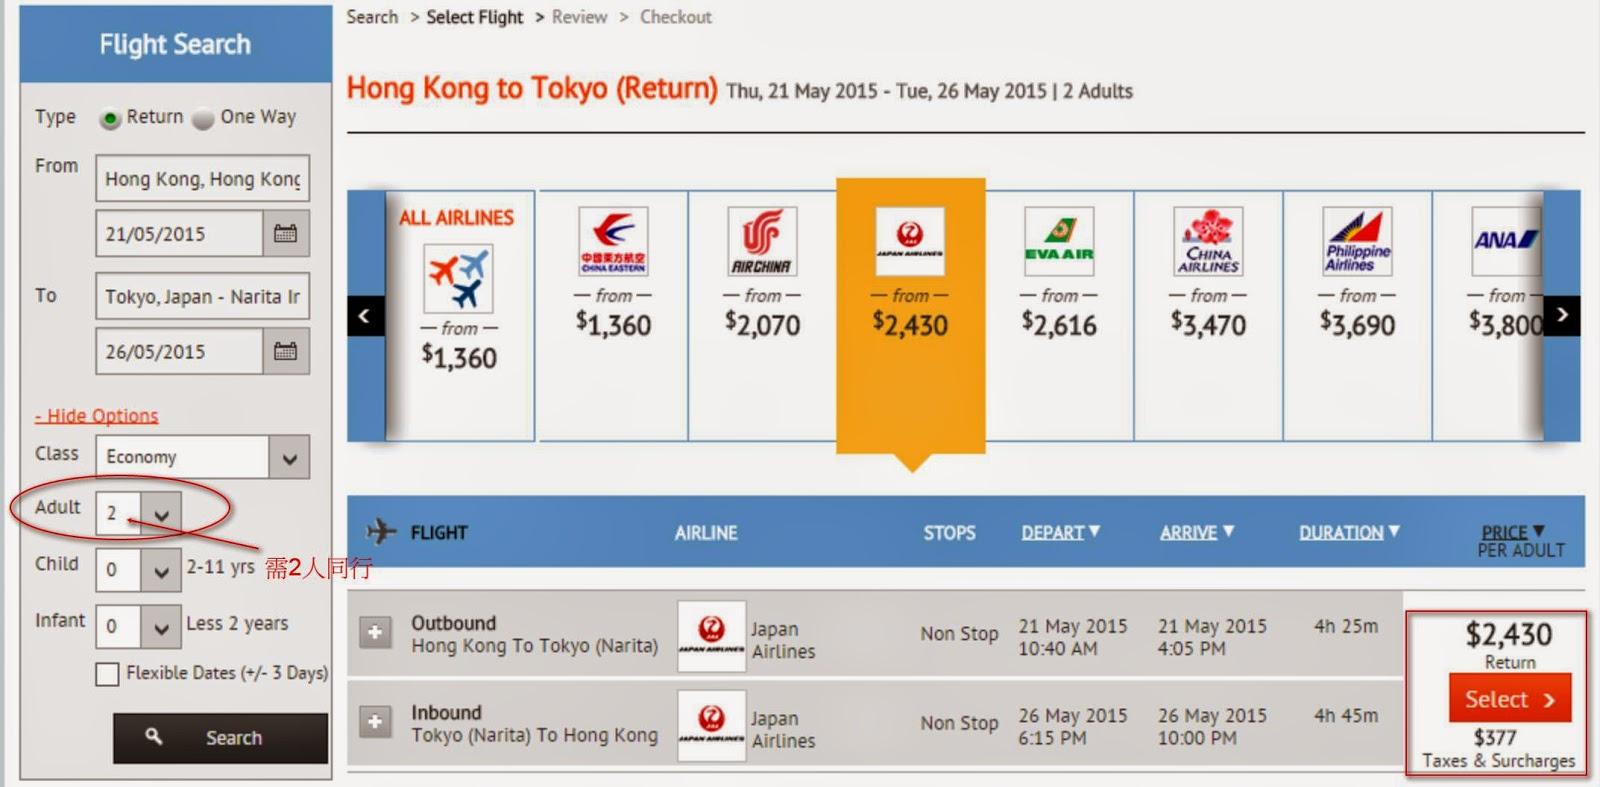 JAL 香港往來東京(成田) 2人價錢$4,860(連稅$5,614) 平均每人$2,430(連稅$2,807)